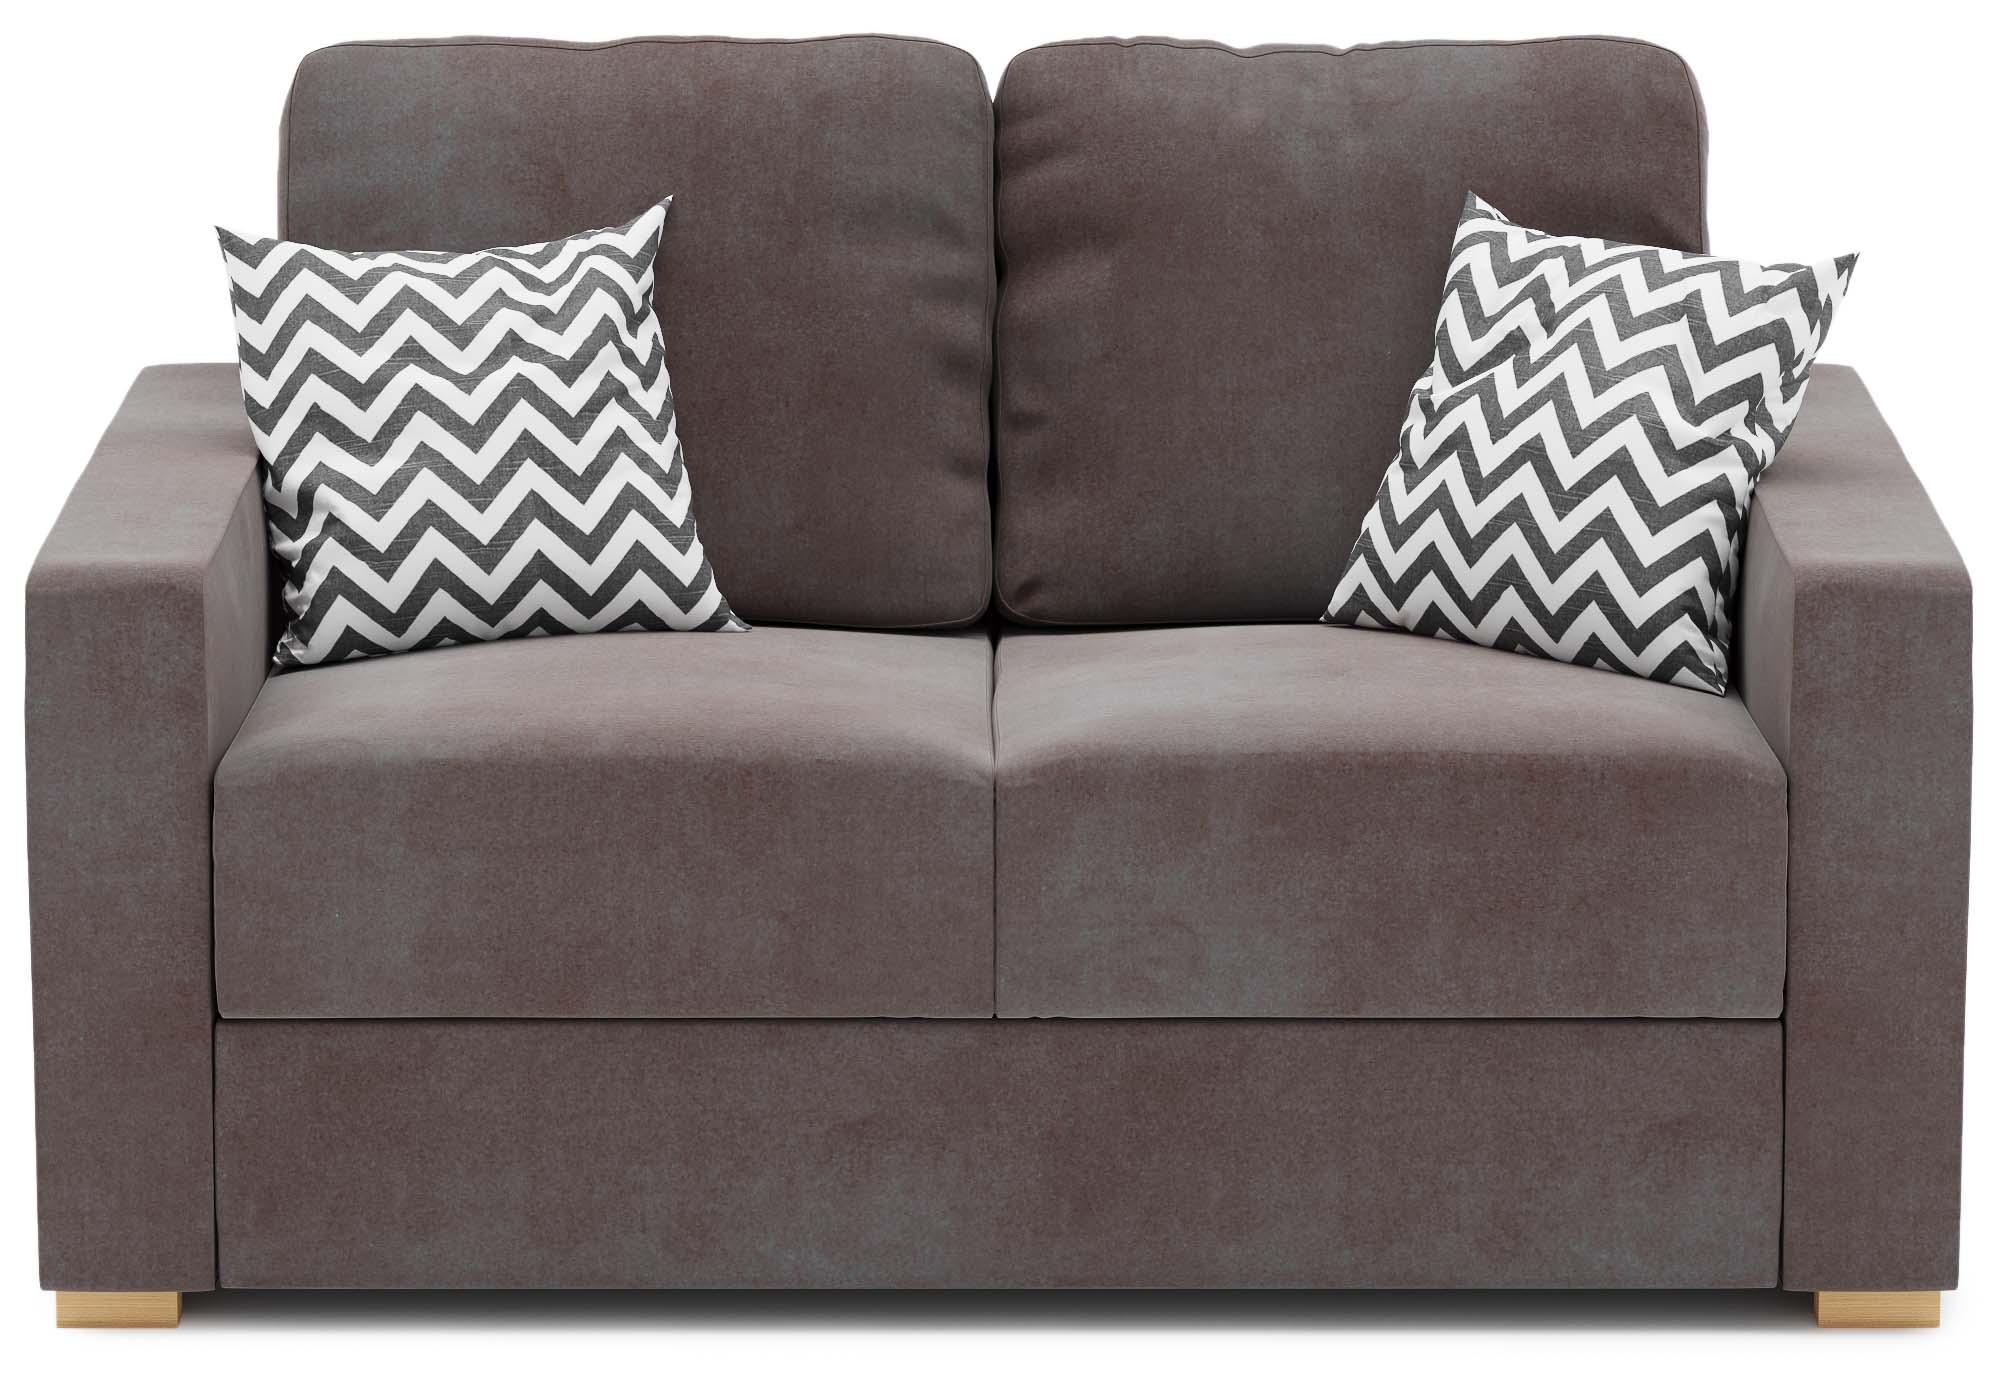 Lear 2 Seat Sofa Bed Small Sofa Bed Nabru